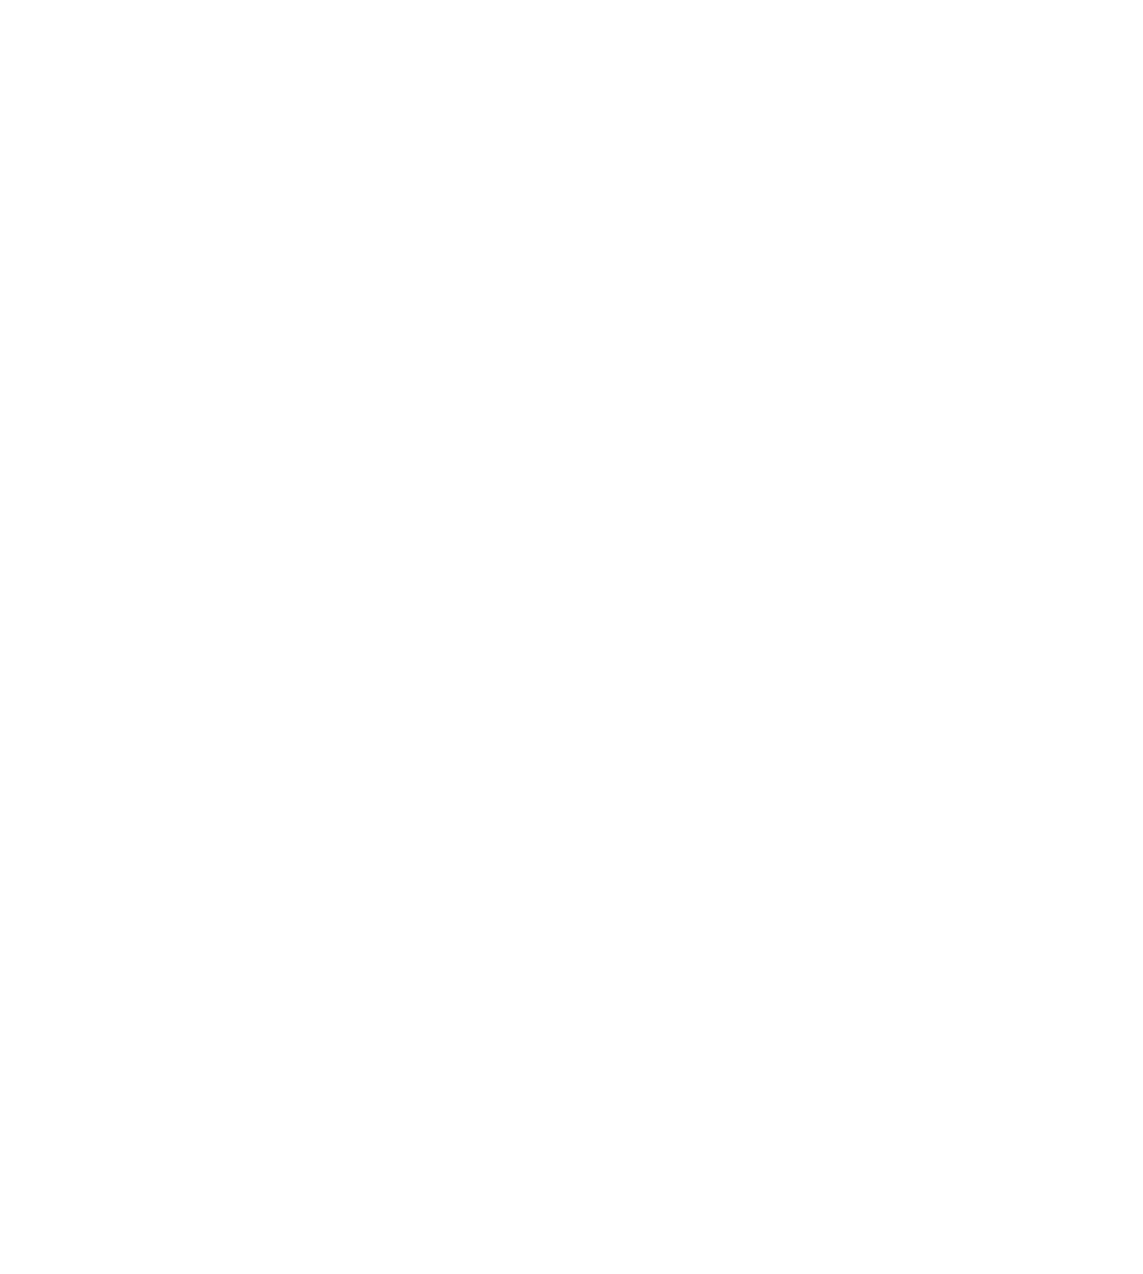 Logo Rhétos CRMT Herve